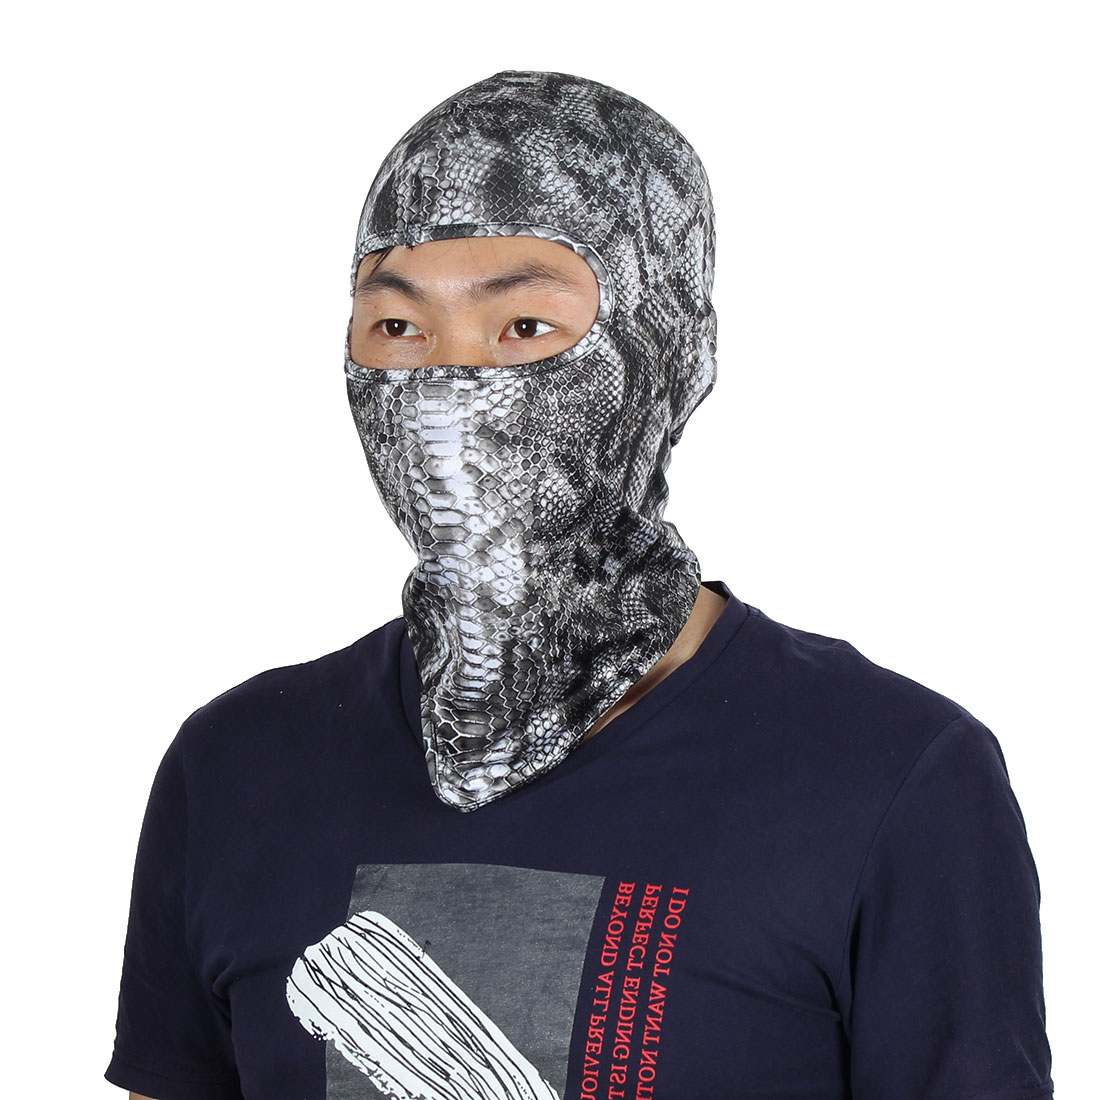 Serpentine Pattern Full Coverage Face Neck Protector Hood Helmet Balaclava Black